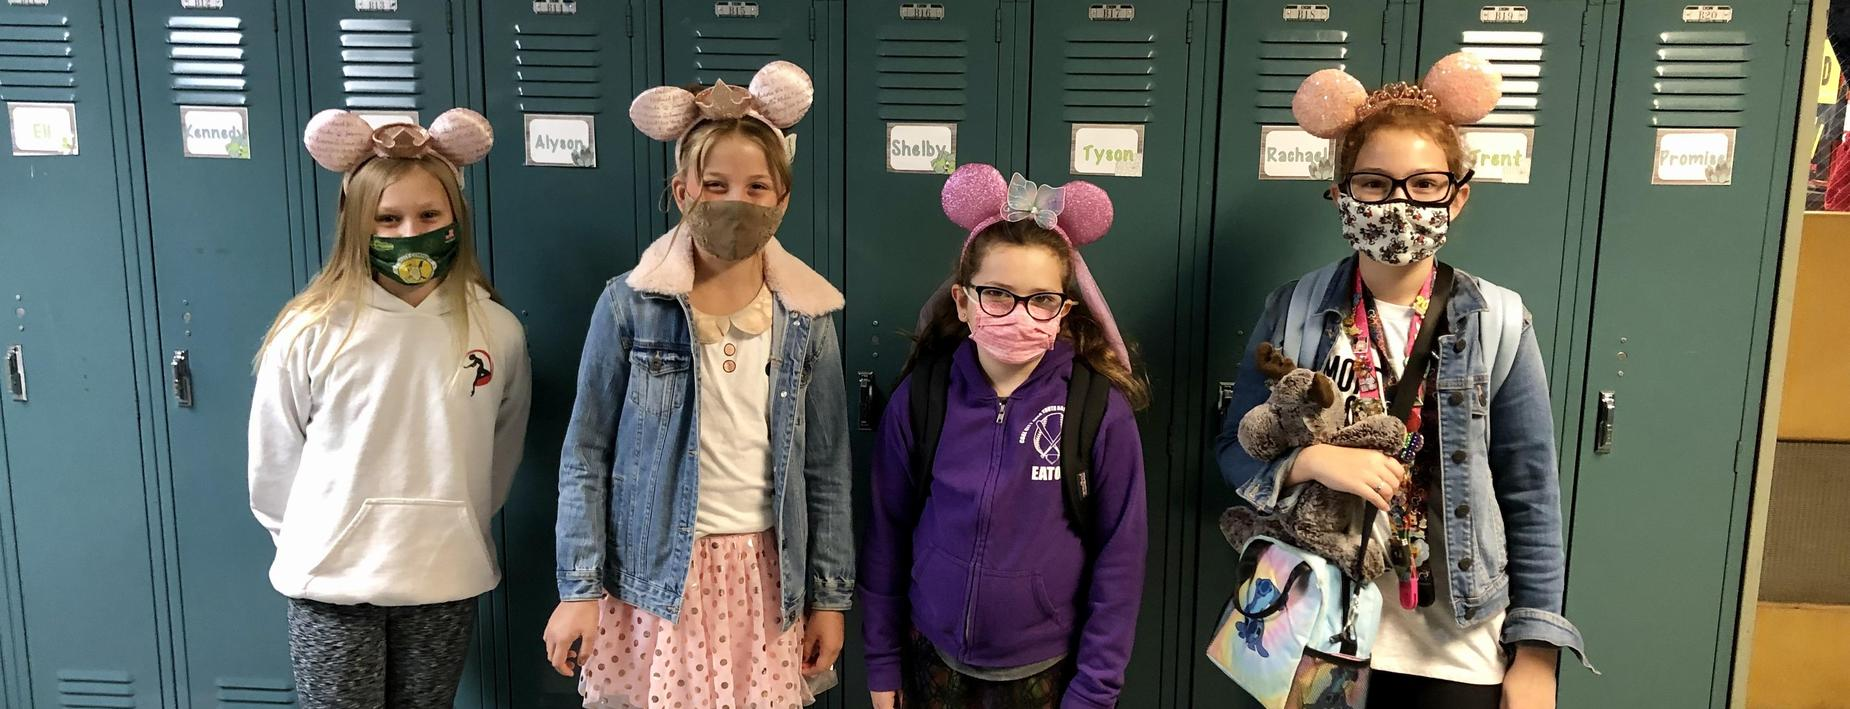 Mickey day